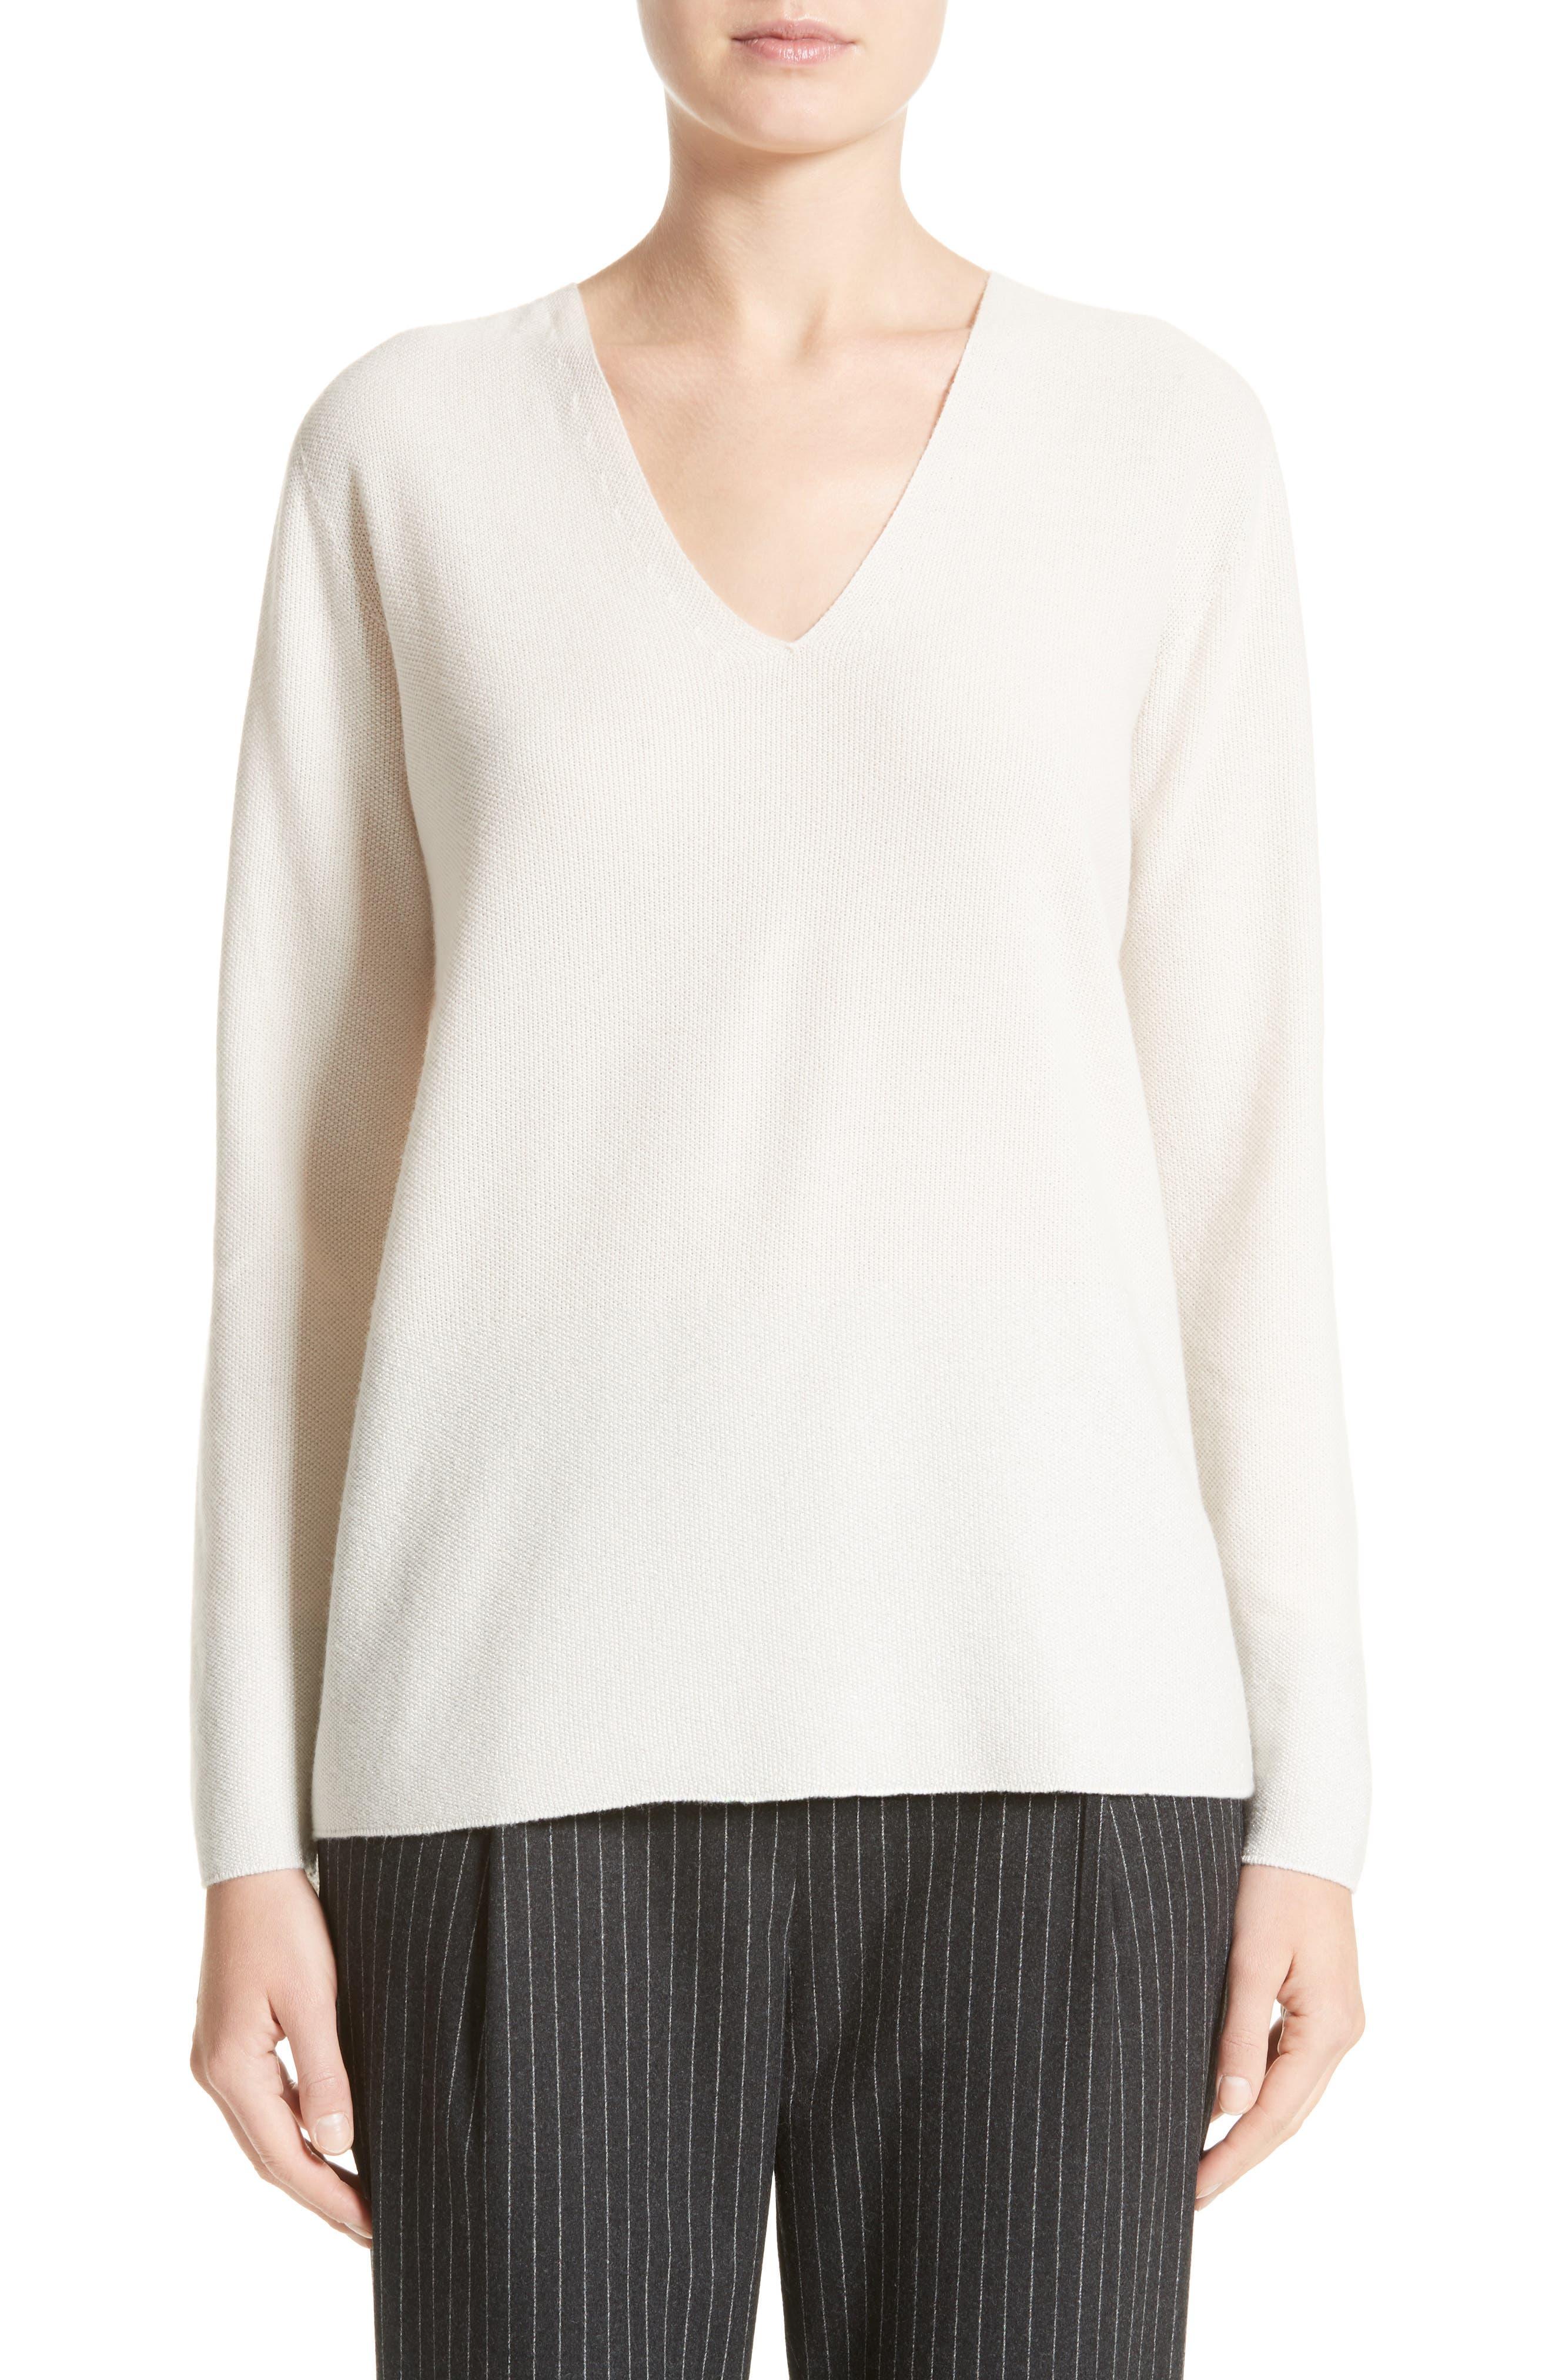 Wool, Silk & Cashmere Micro Popcorn Stitch Sweater,                             Main thumbnail 1, color,                             101